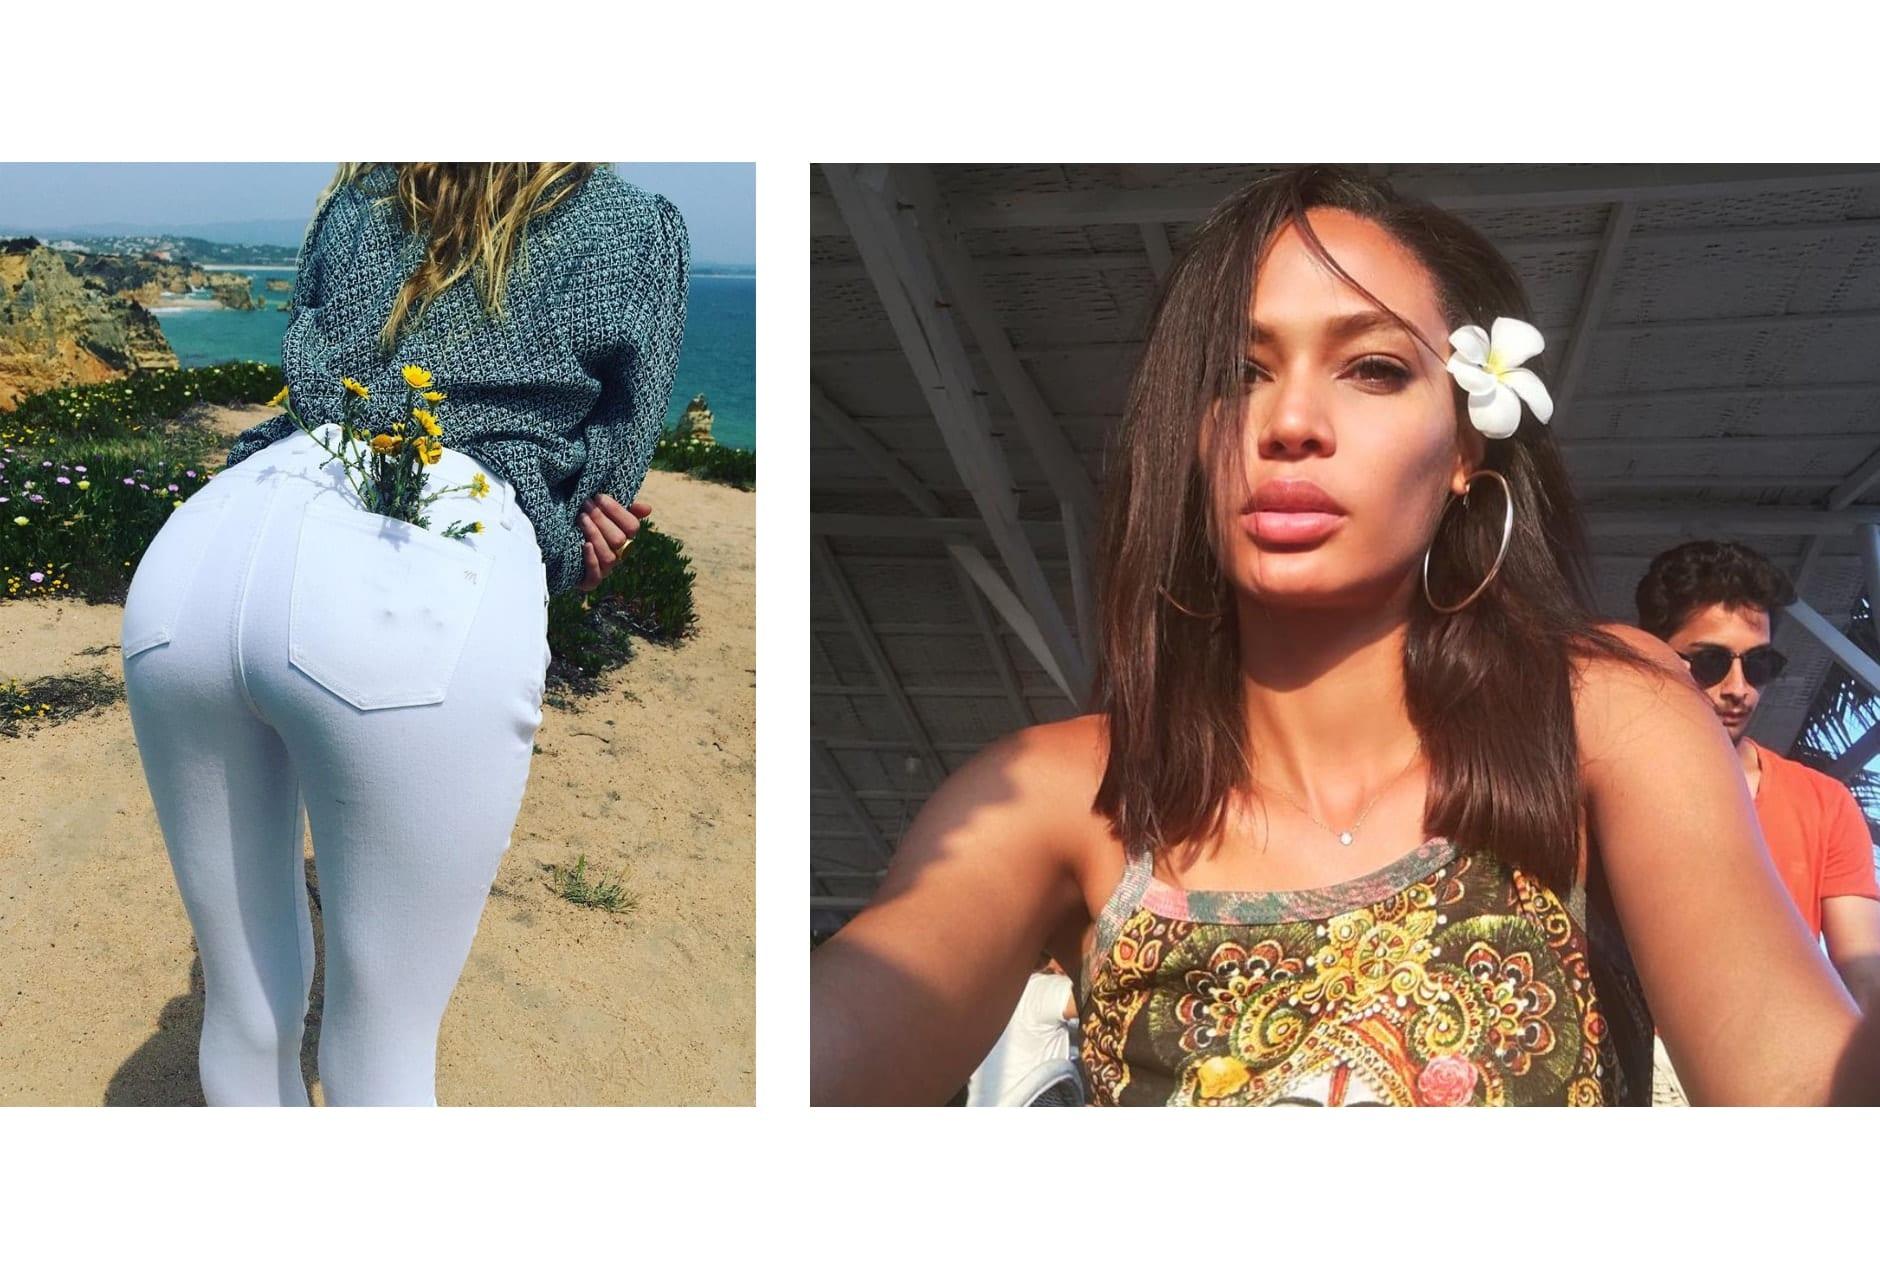 FLOWERS_constancejablonski_joansmalls-min